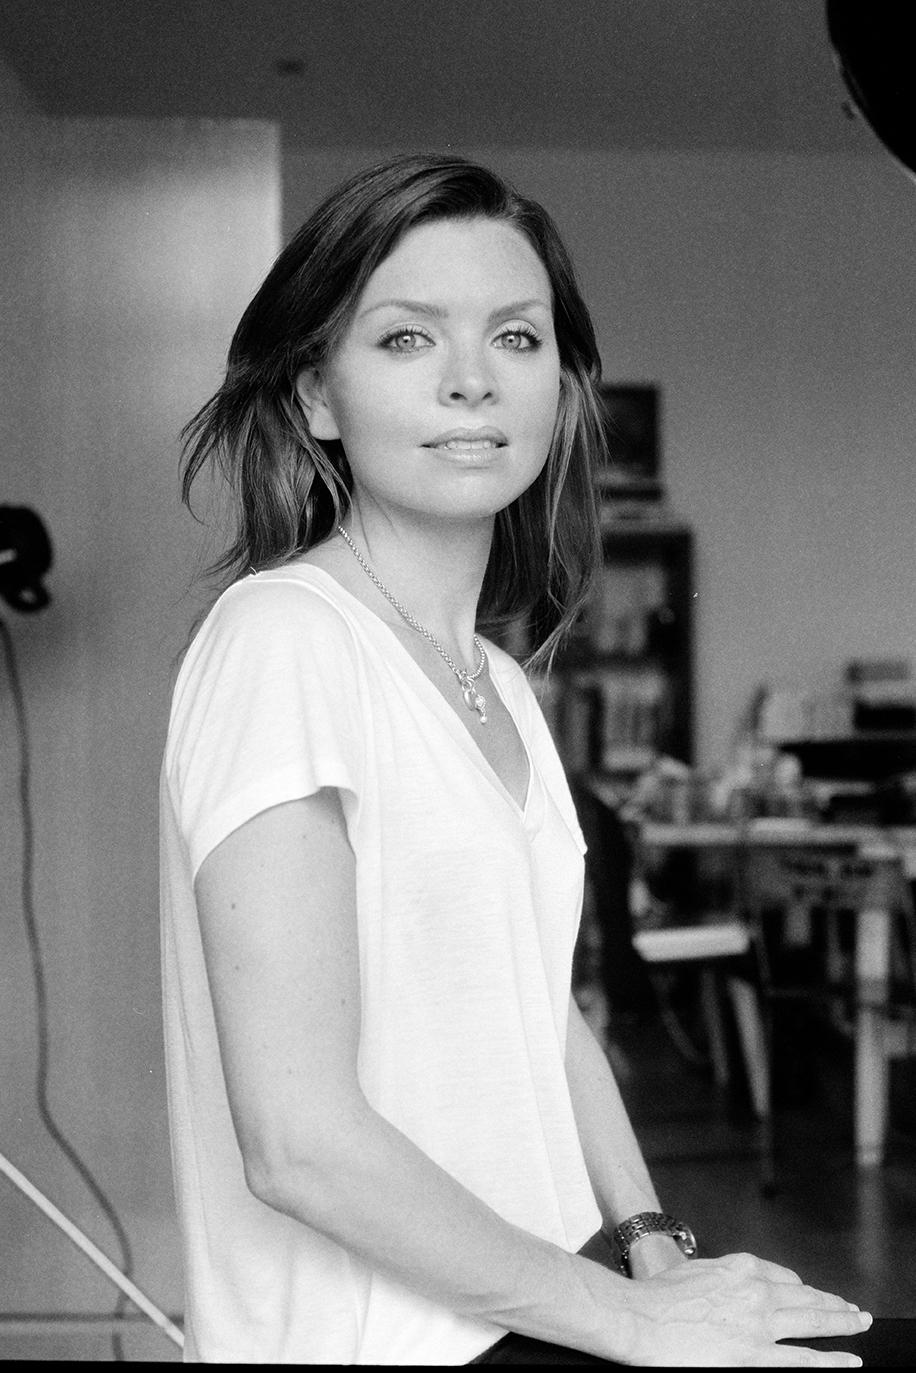 Portrait of Brand Owner Nicola Fiveash in a studio